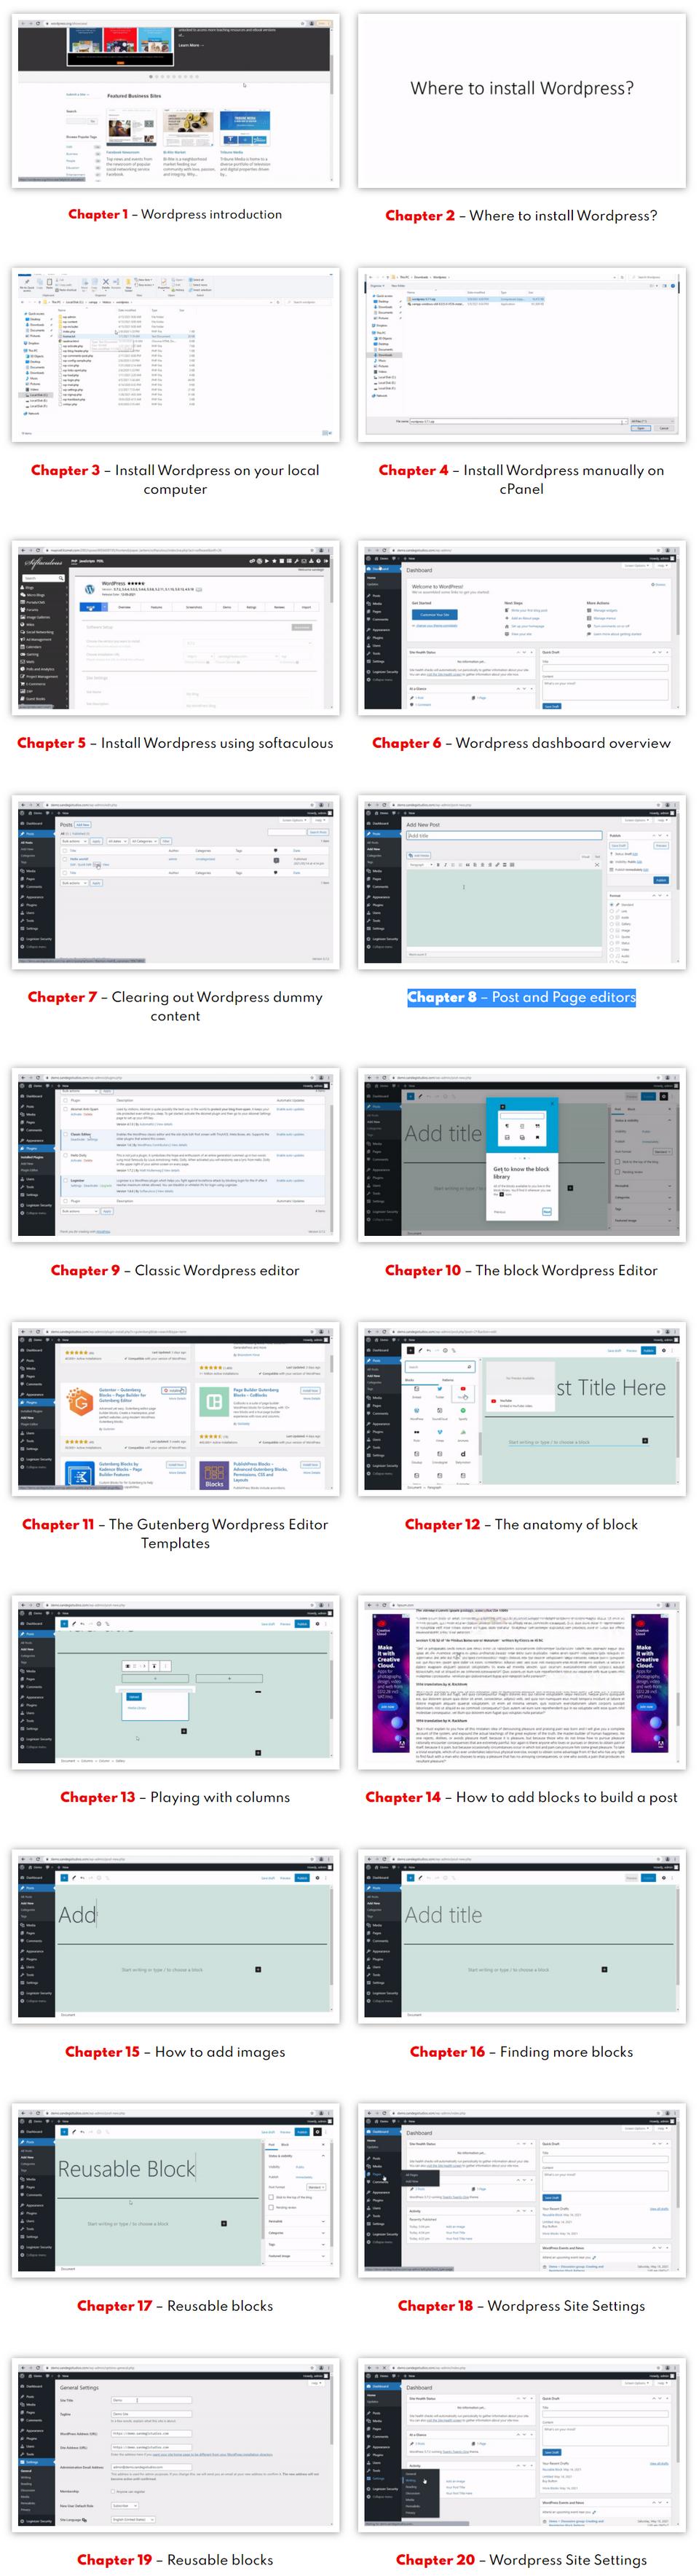 Advance-WordPress-Mastery-Kit-PLR-feature-6